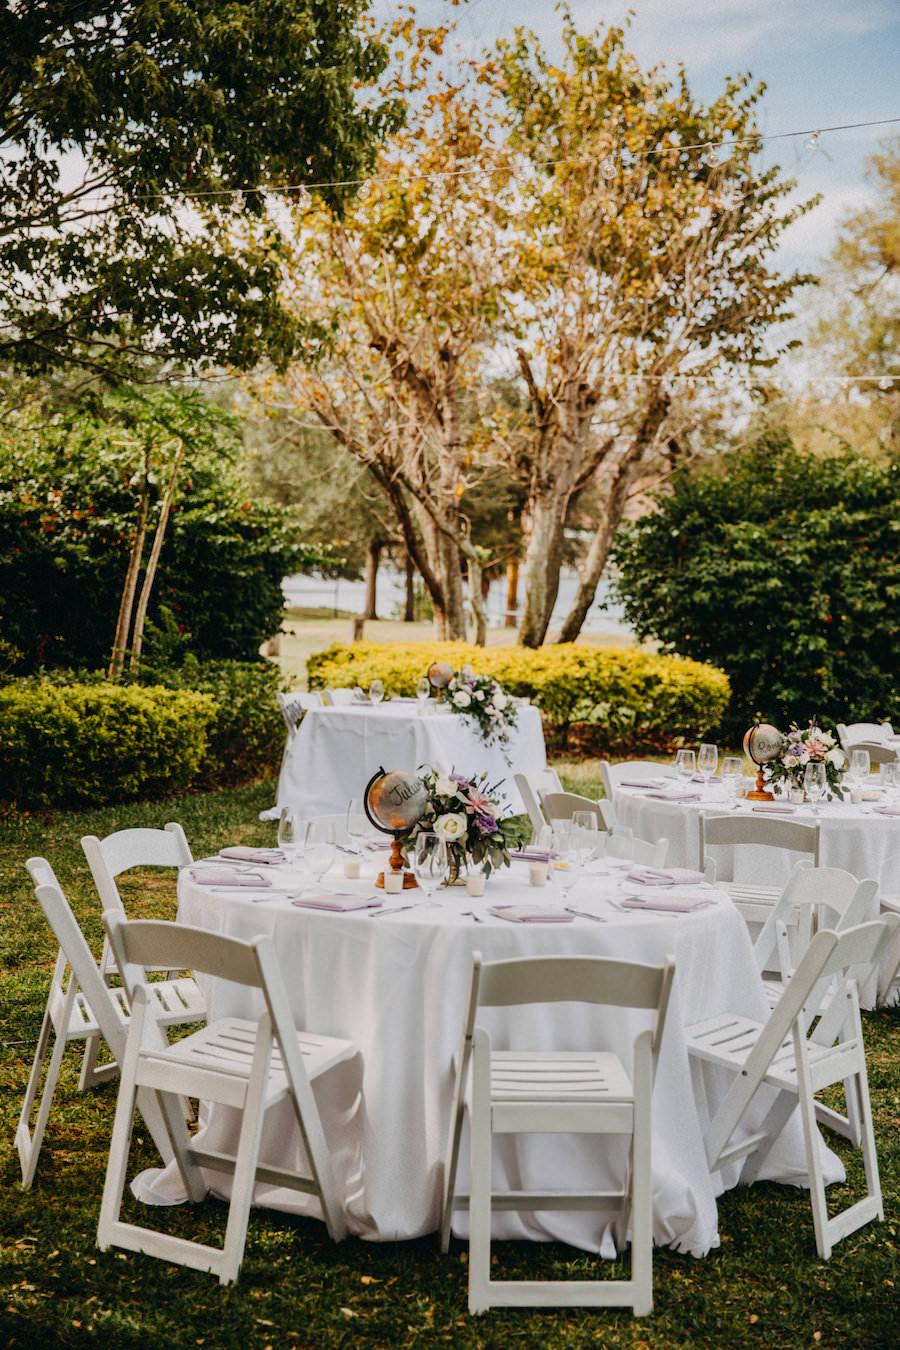 White Garden Wedding Reception Decor with Folding Chairs   Outdoor Tampa Bay Garden Wedding Venue Davis Islands Garden Club